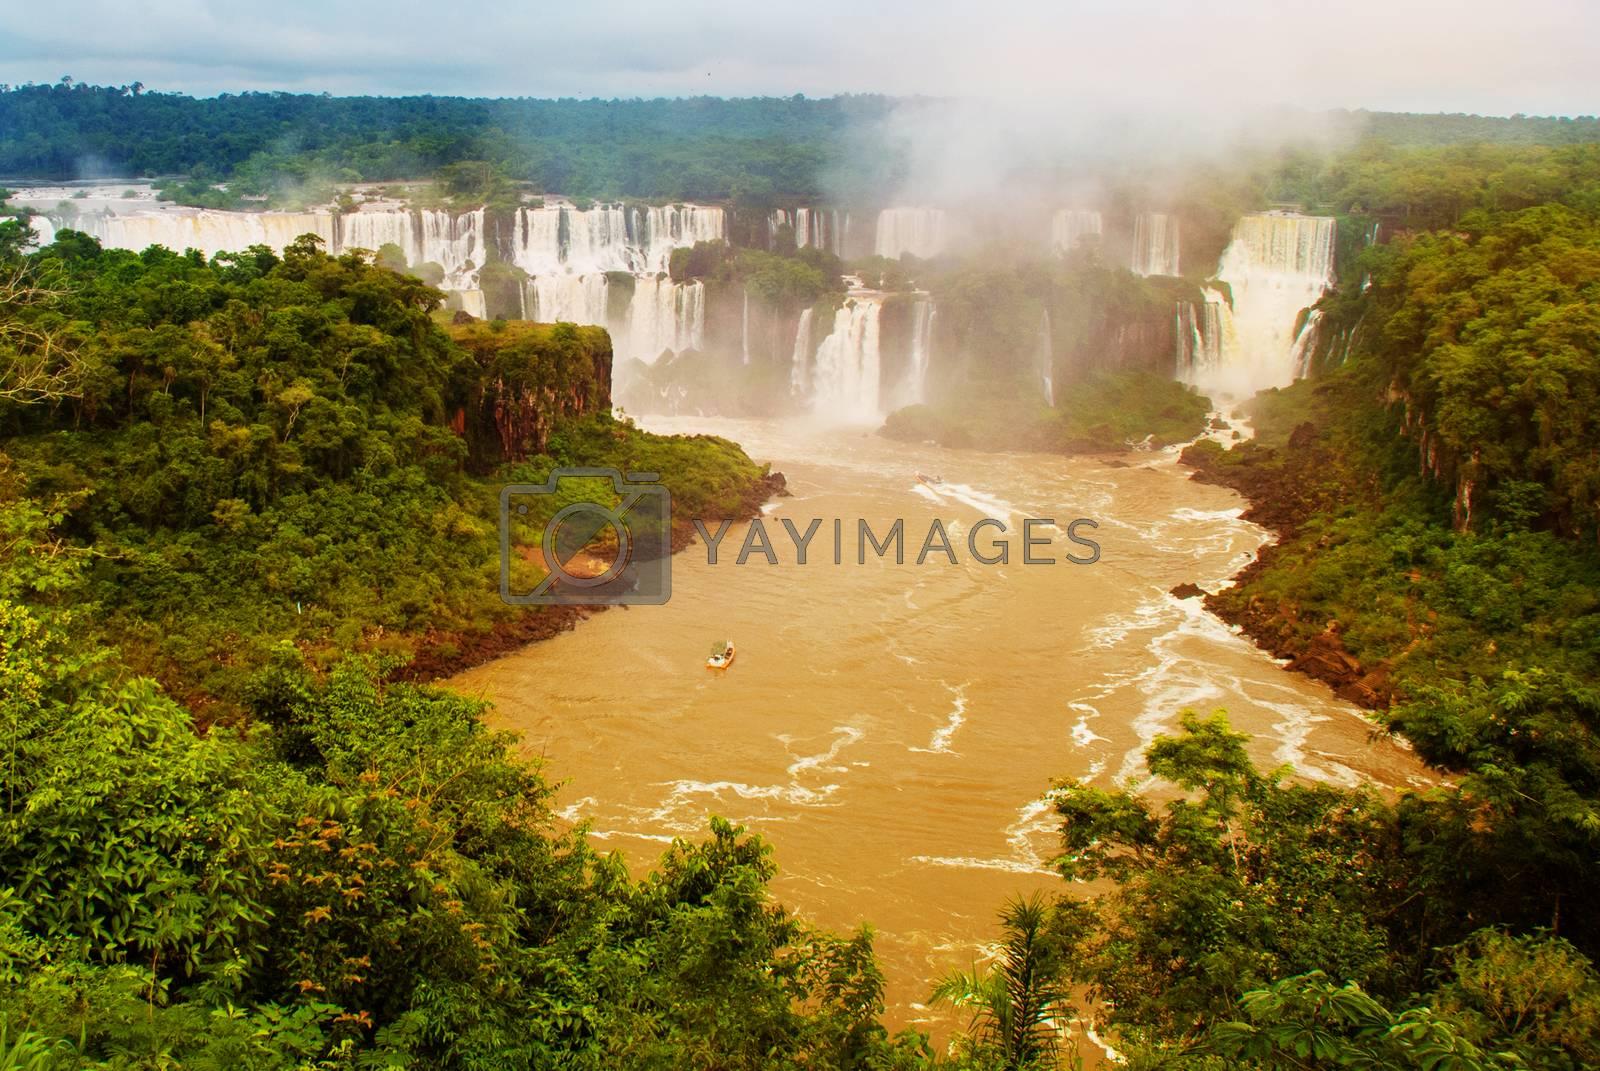 Waterfalls of Iguacu in Brazil. Brazilian side of the waterfalls. Powerful water energy. UNESCO world heritage.